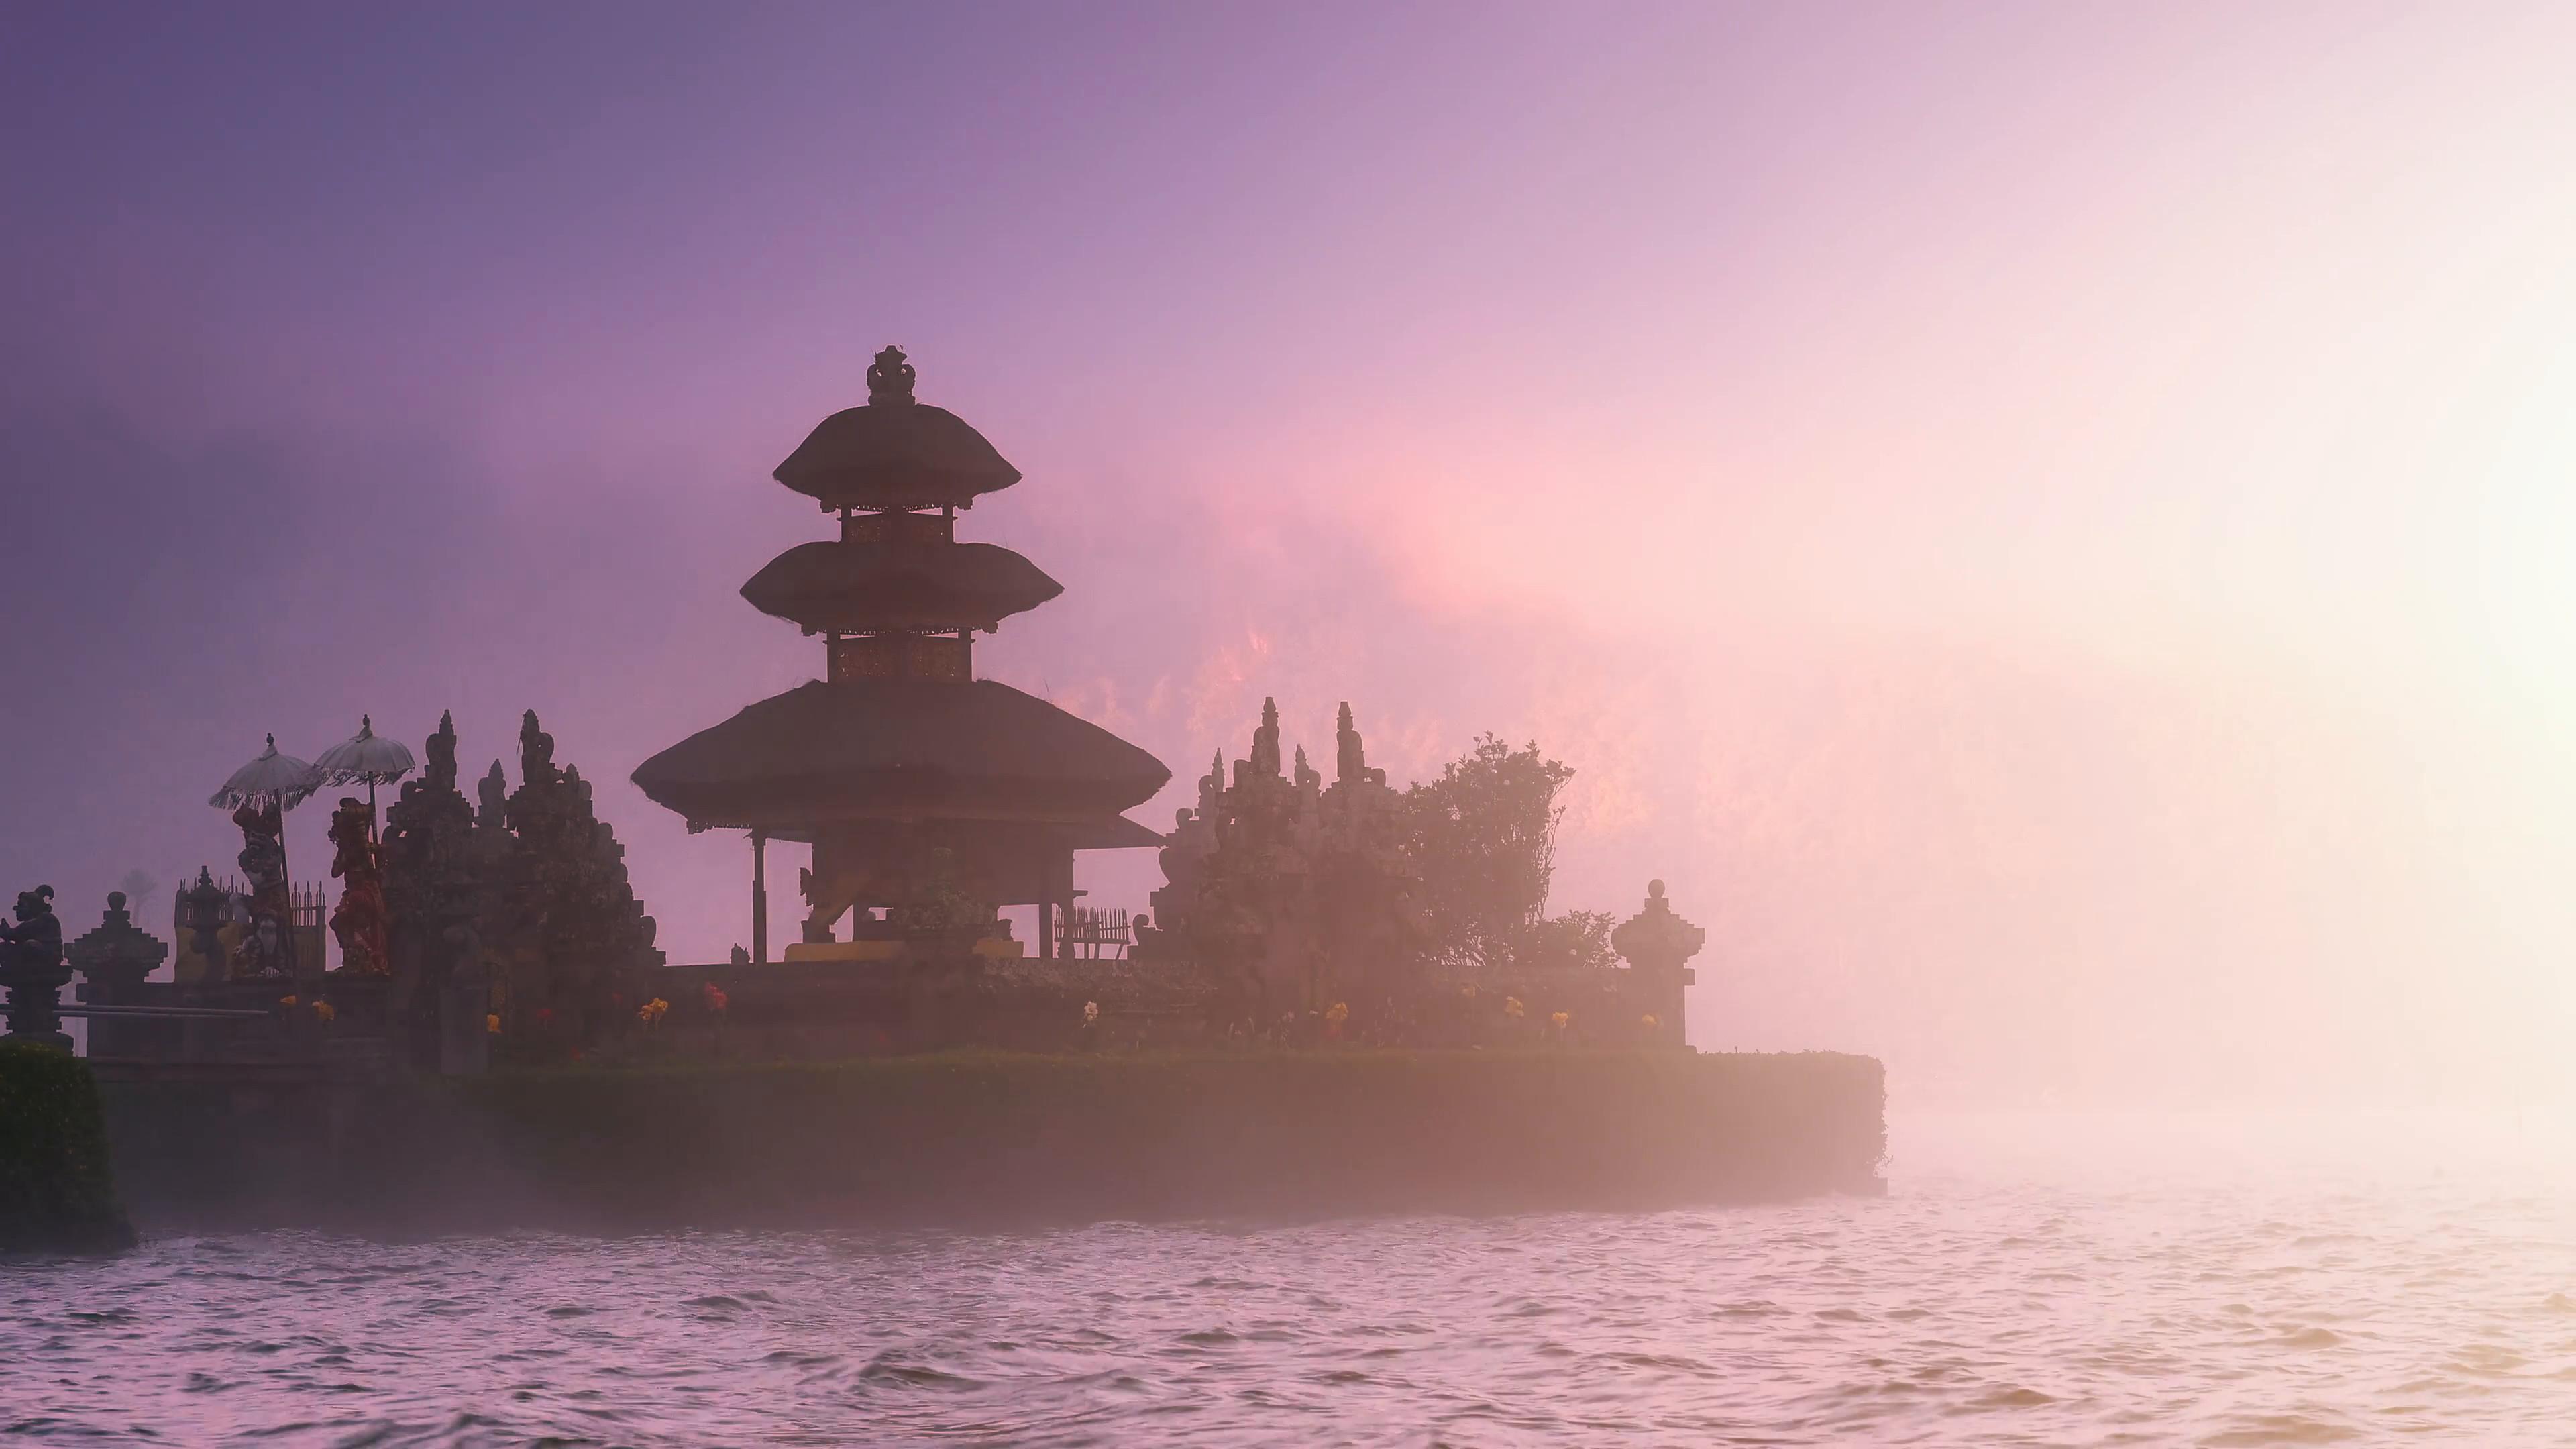 Scenic background of beautiful Bali temple in mist on lake under sunset  sunlight Stock Video Footage – VideoBlocks